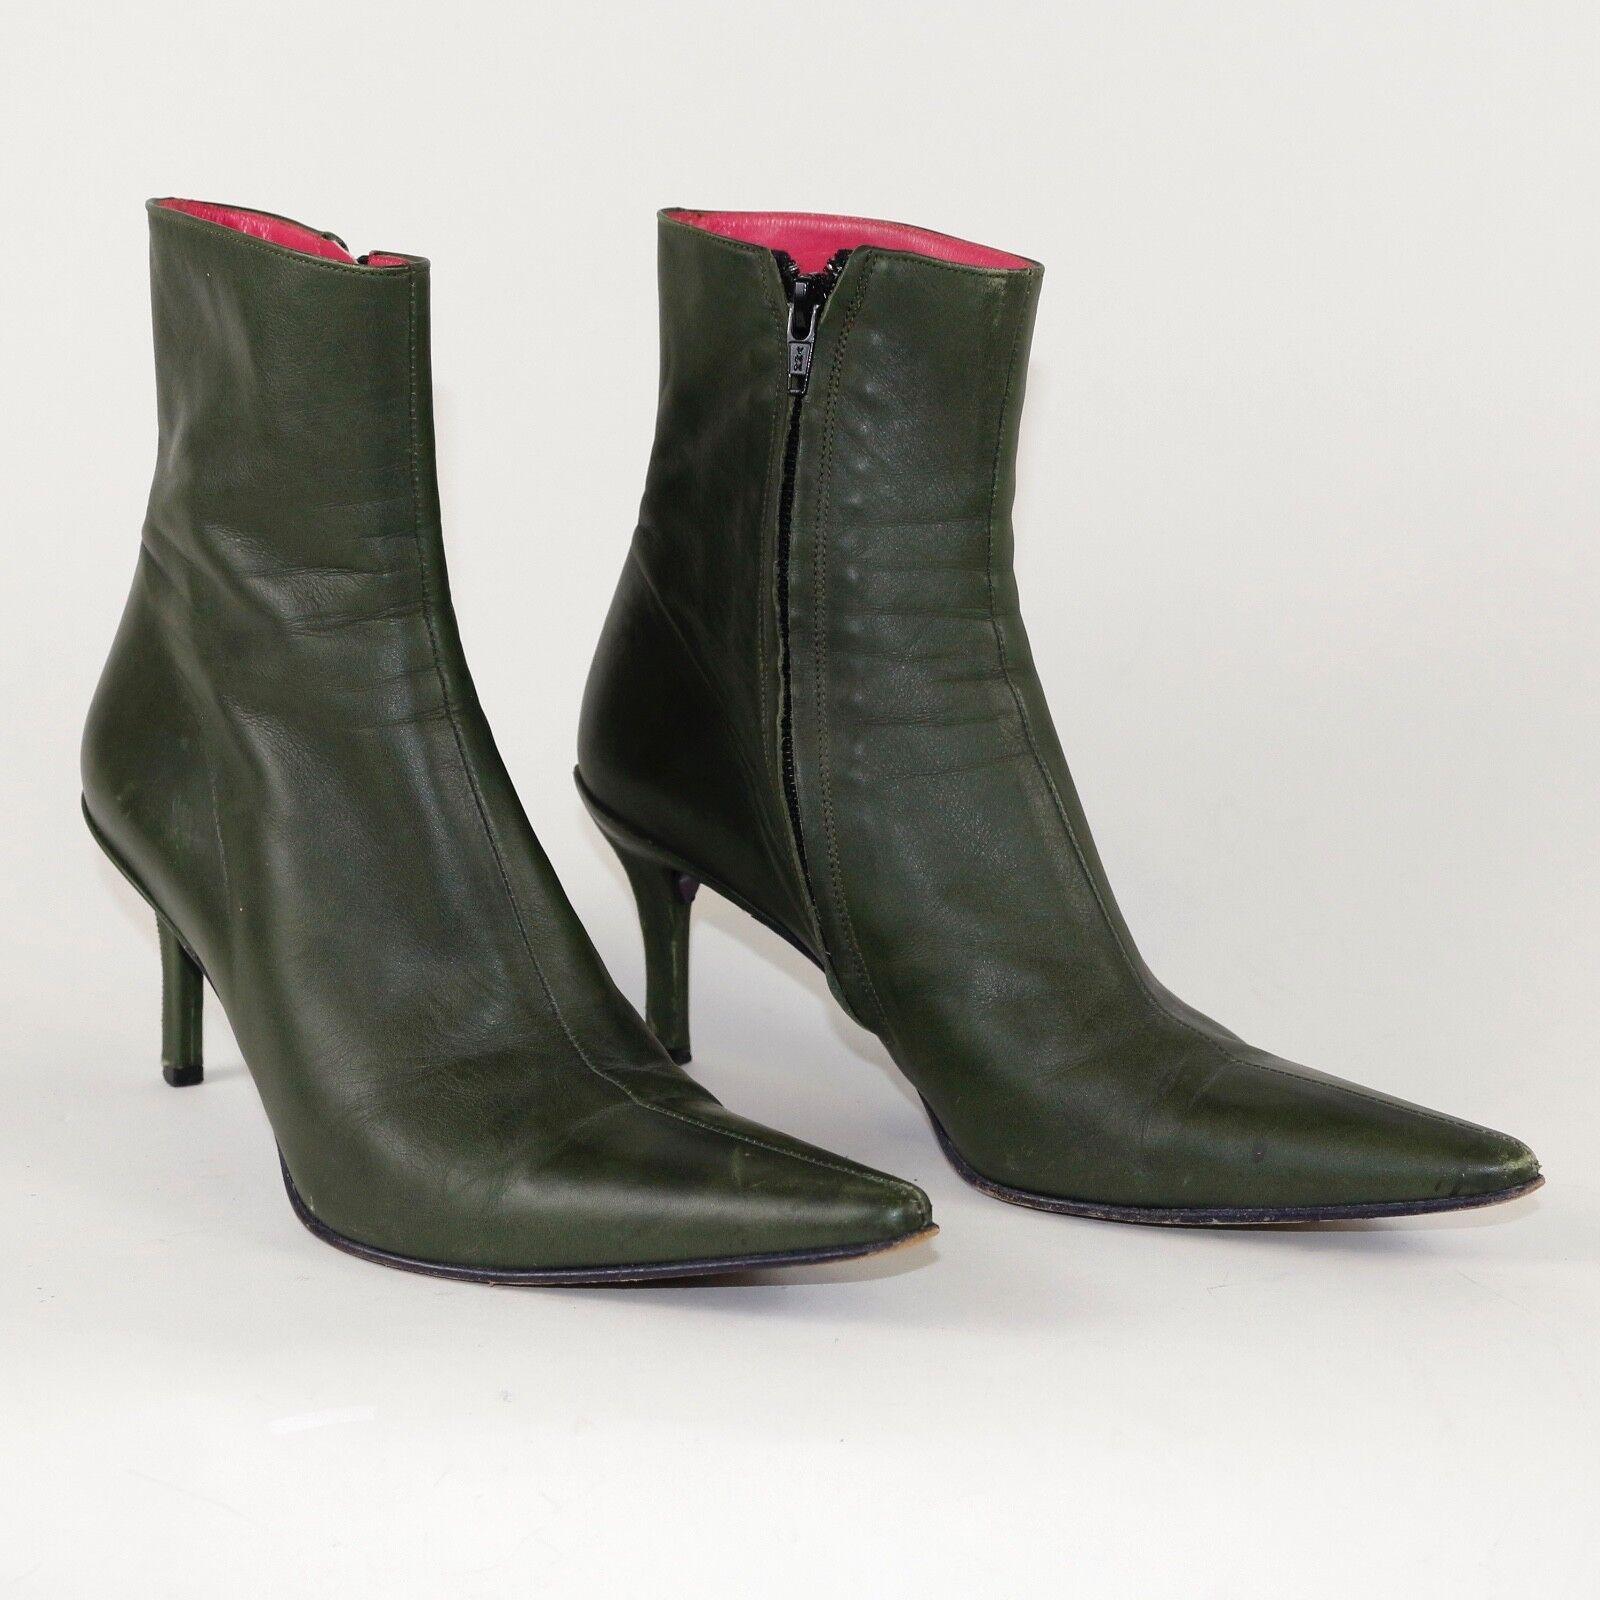 Free Lance Paris Green Olive Leder Stiefel High Heal_Sz 38 1/2